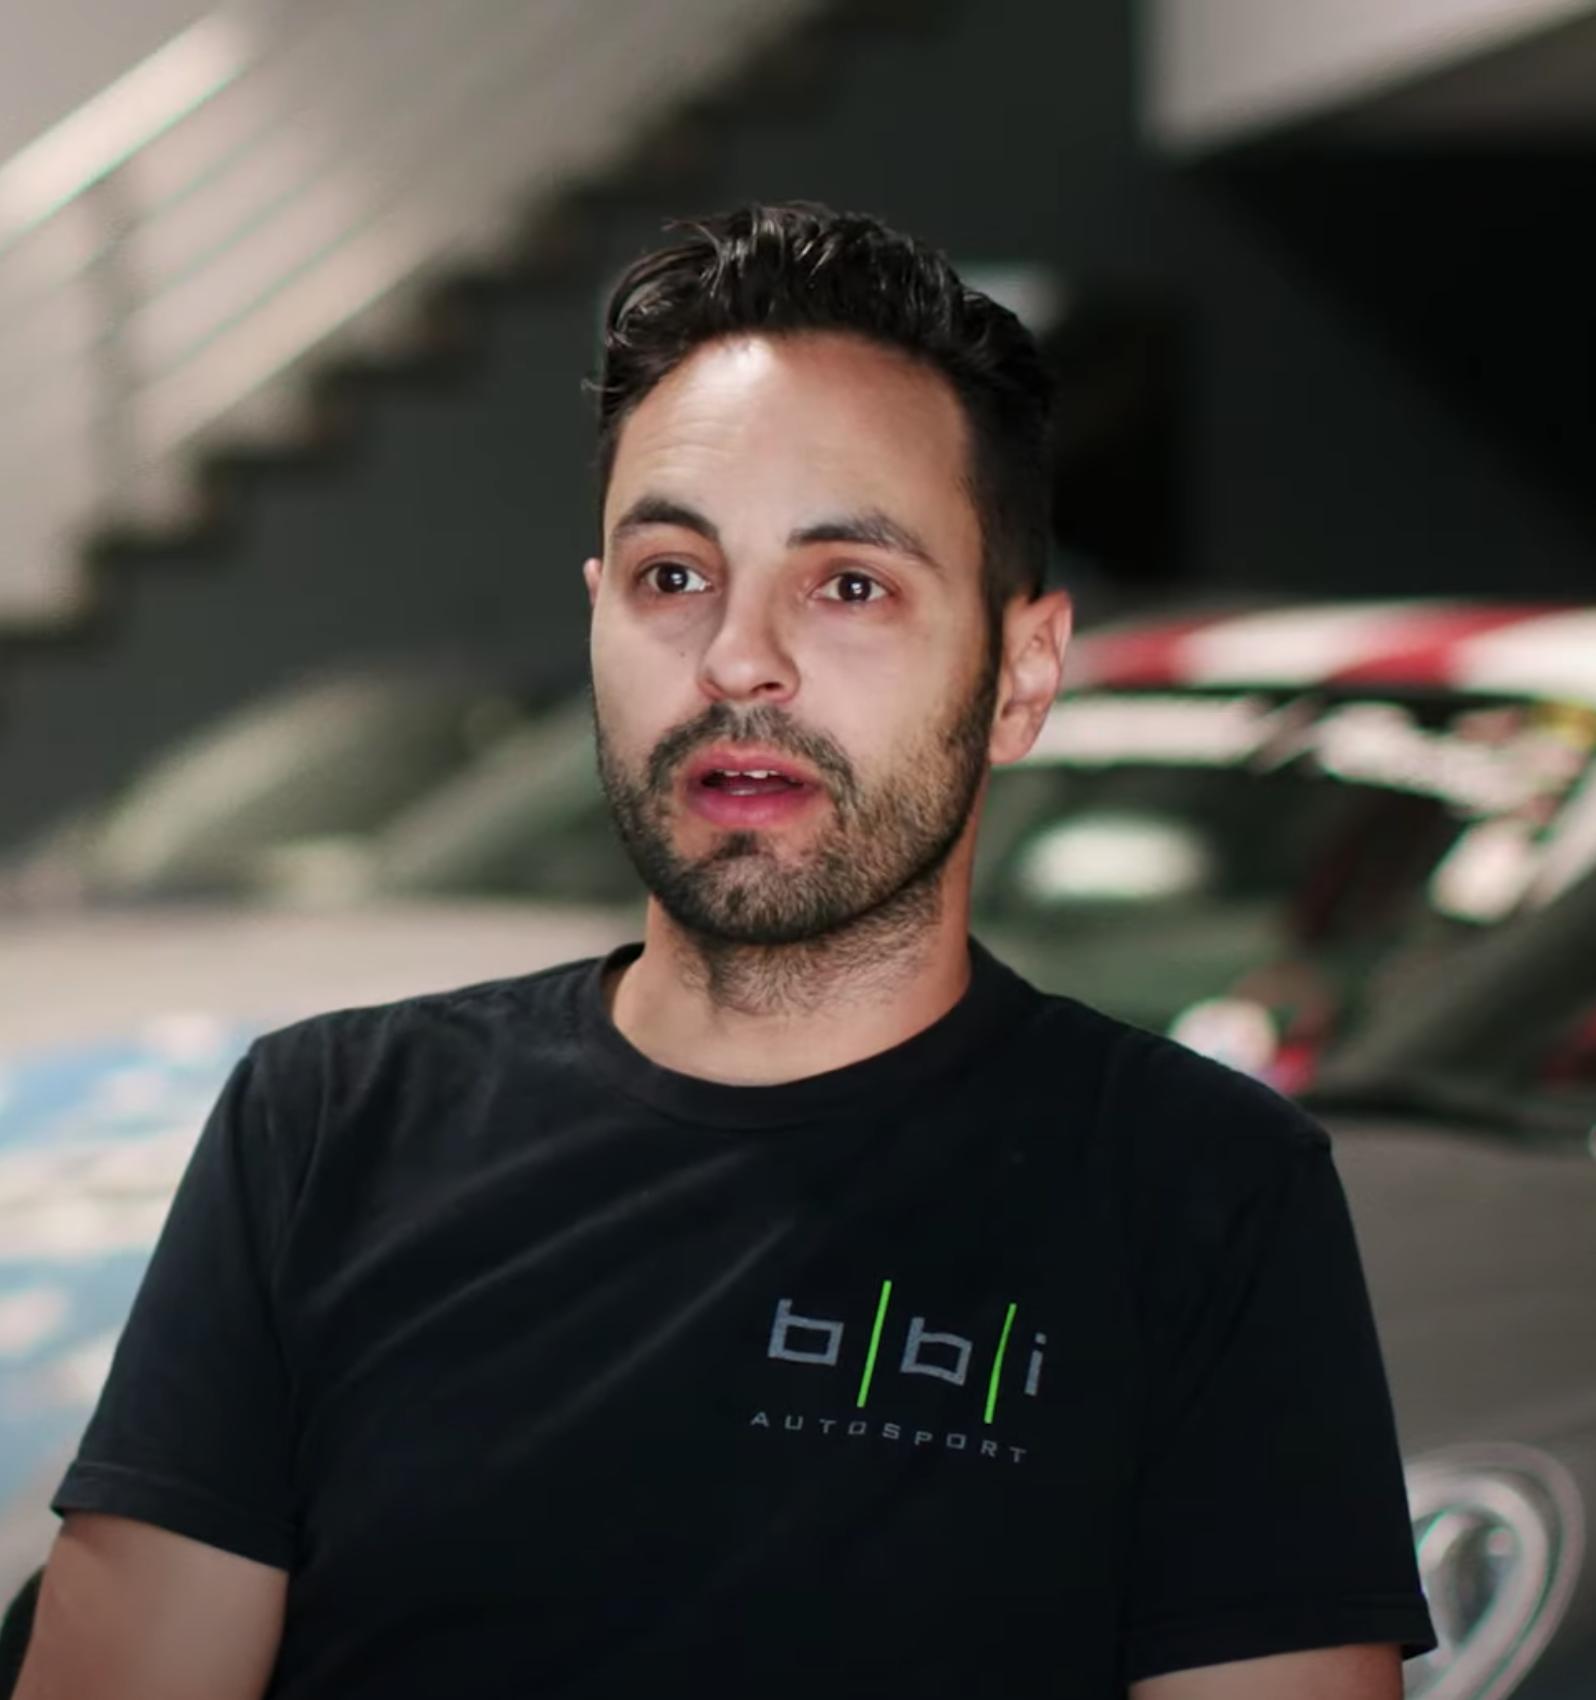 [video thumbnail] BBI Autosport